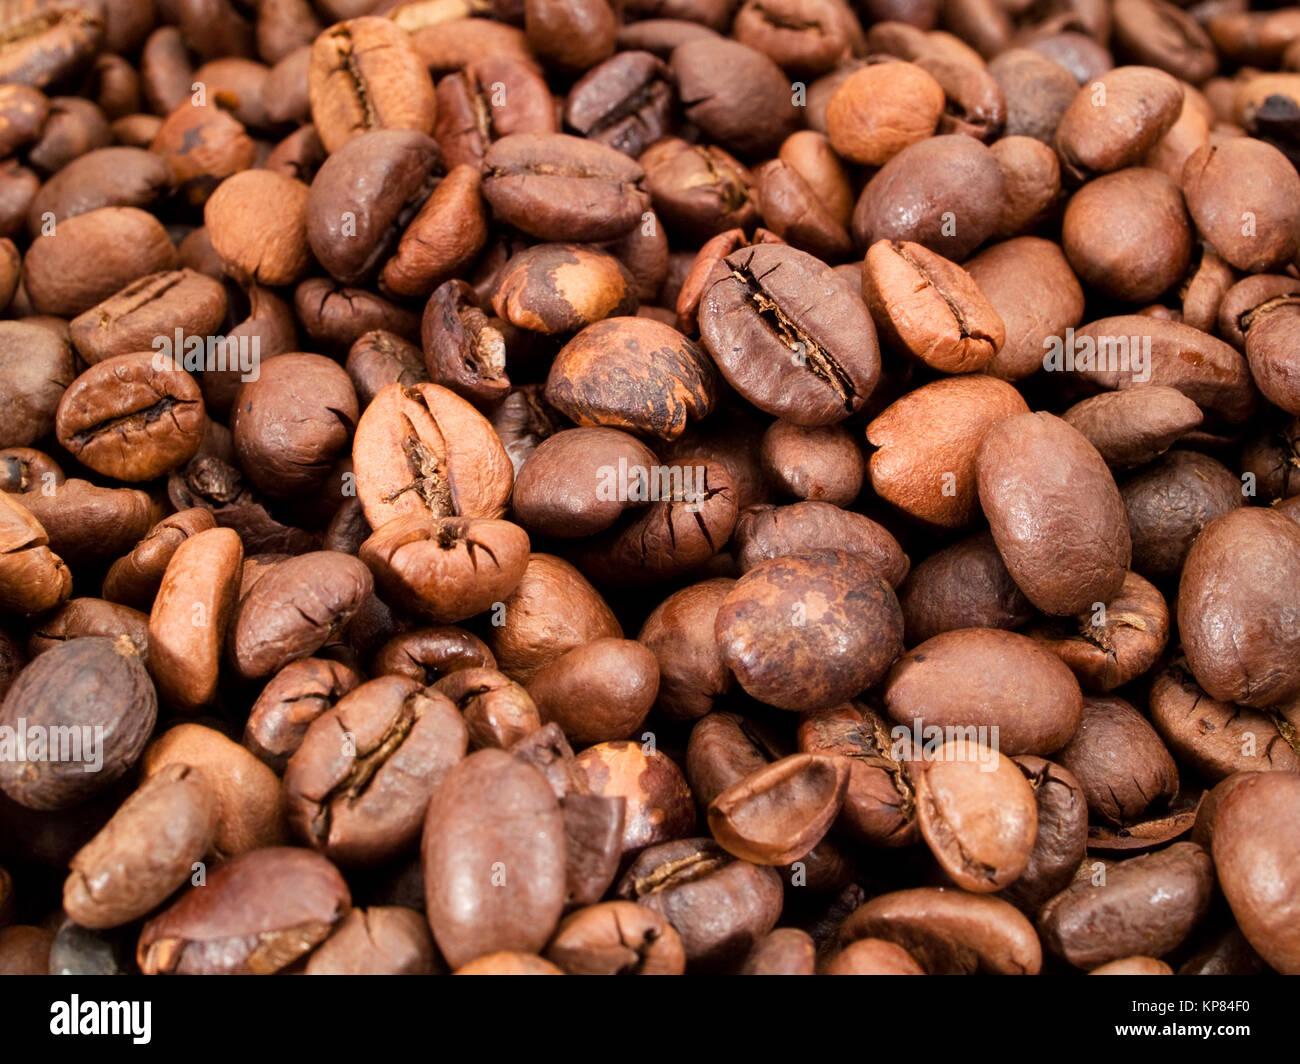 Coffee beans,Coffee beans,Coffee beans,Coffee beans - Stock Image